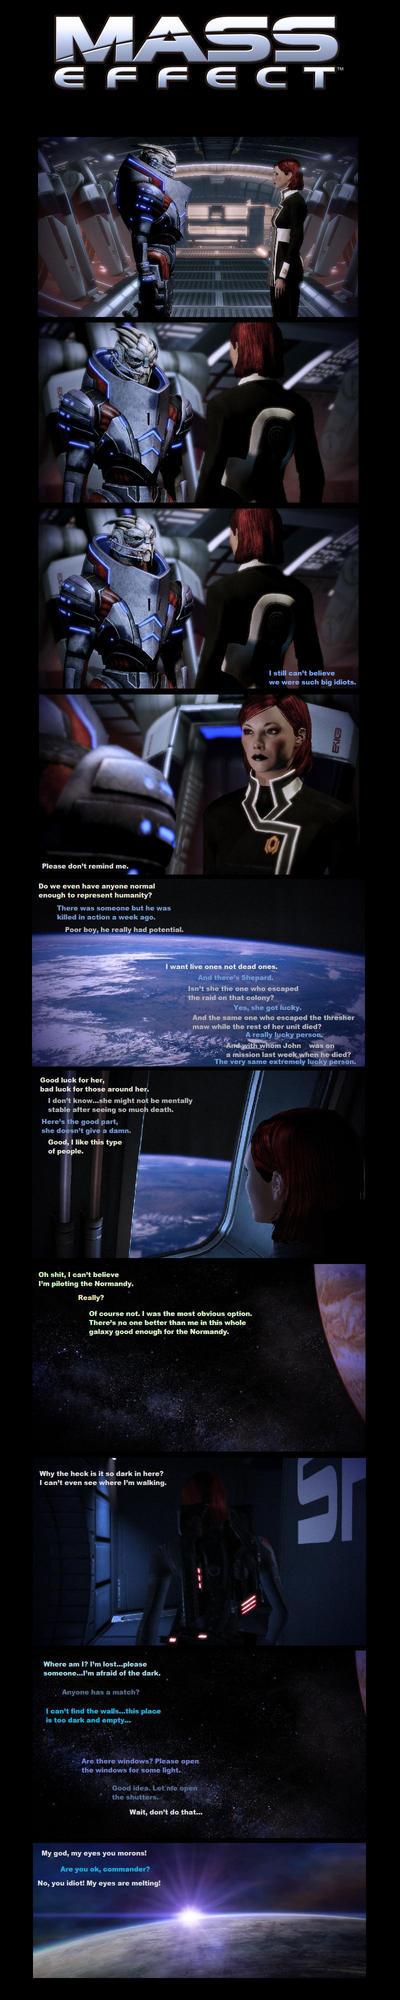 Mass Effect Flashback - P1 by Pomponorium